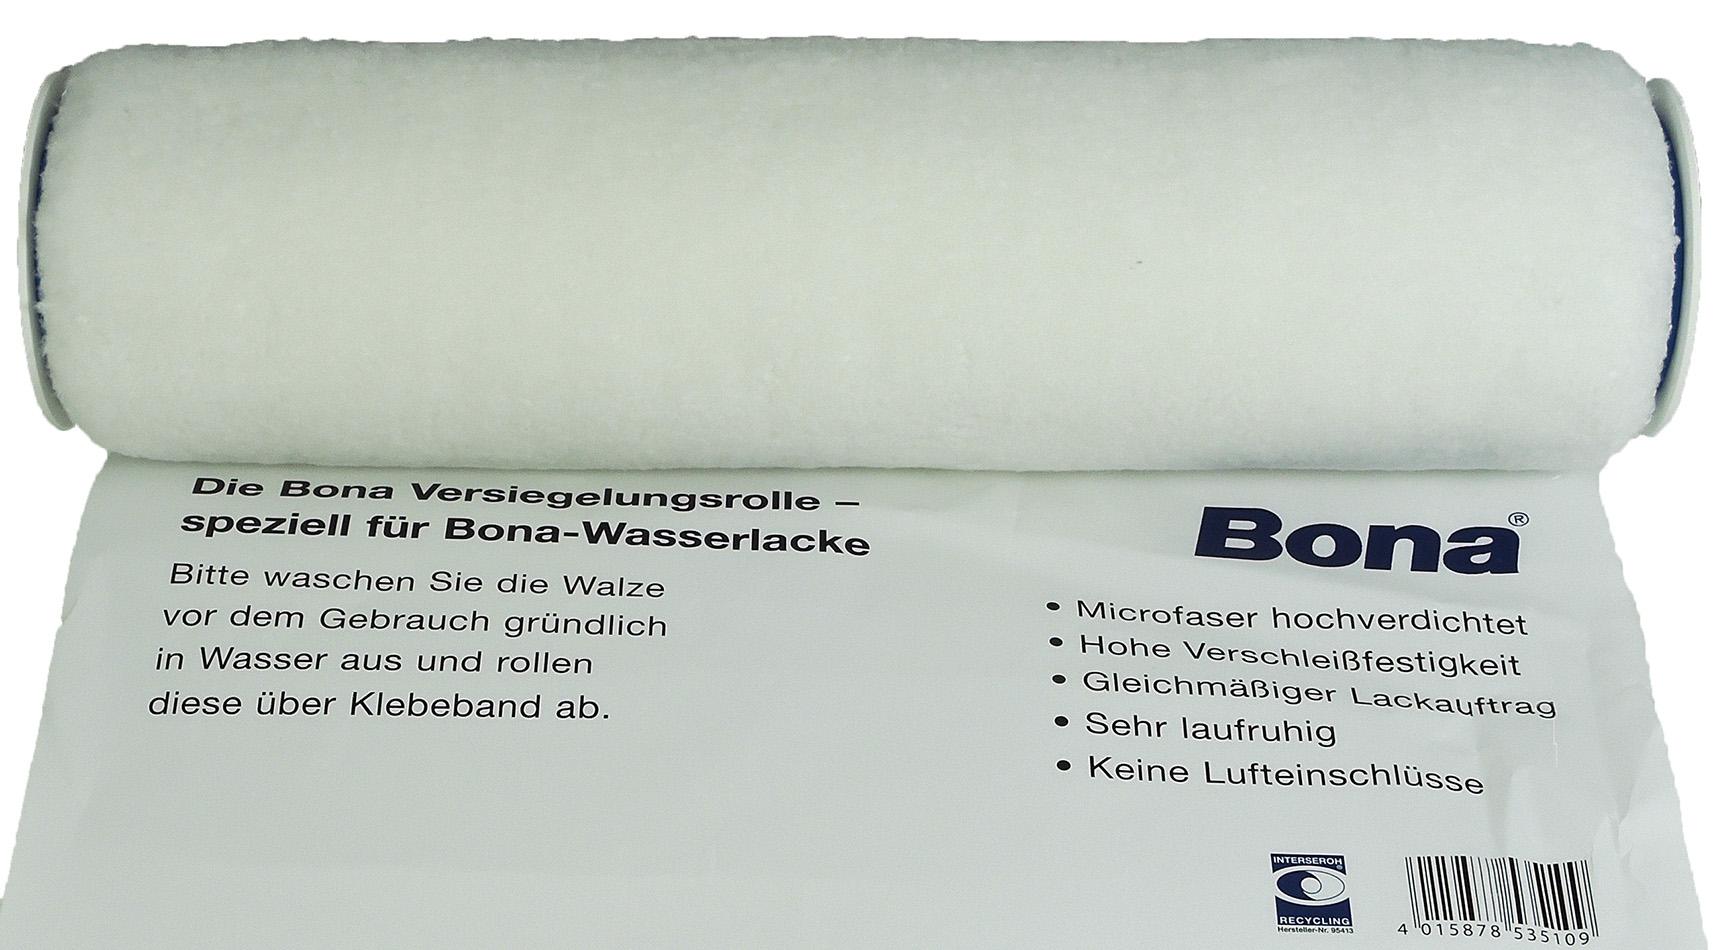 bona versiegelungsrolle lackrolle wasserlackrolle 25 cm | ebay